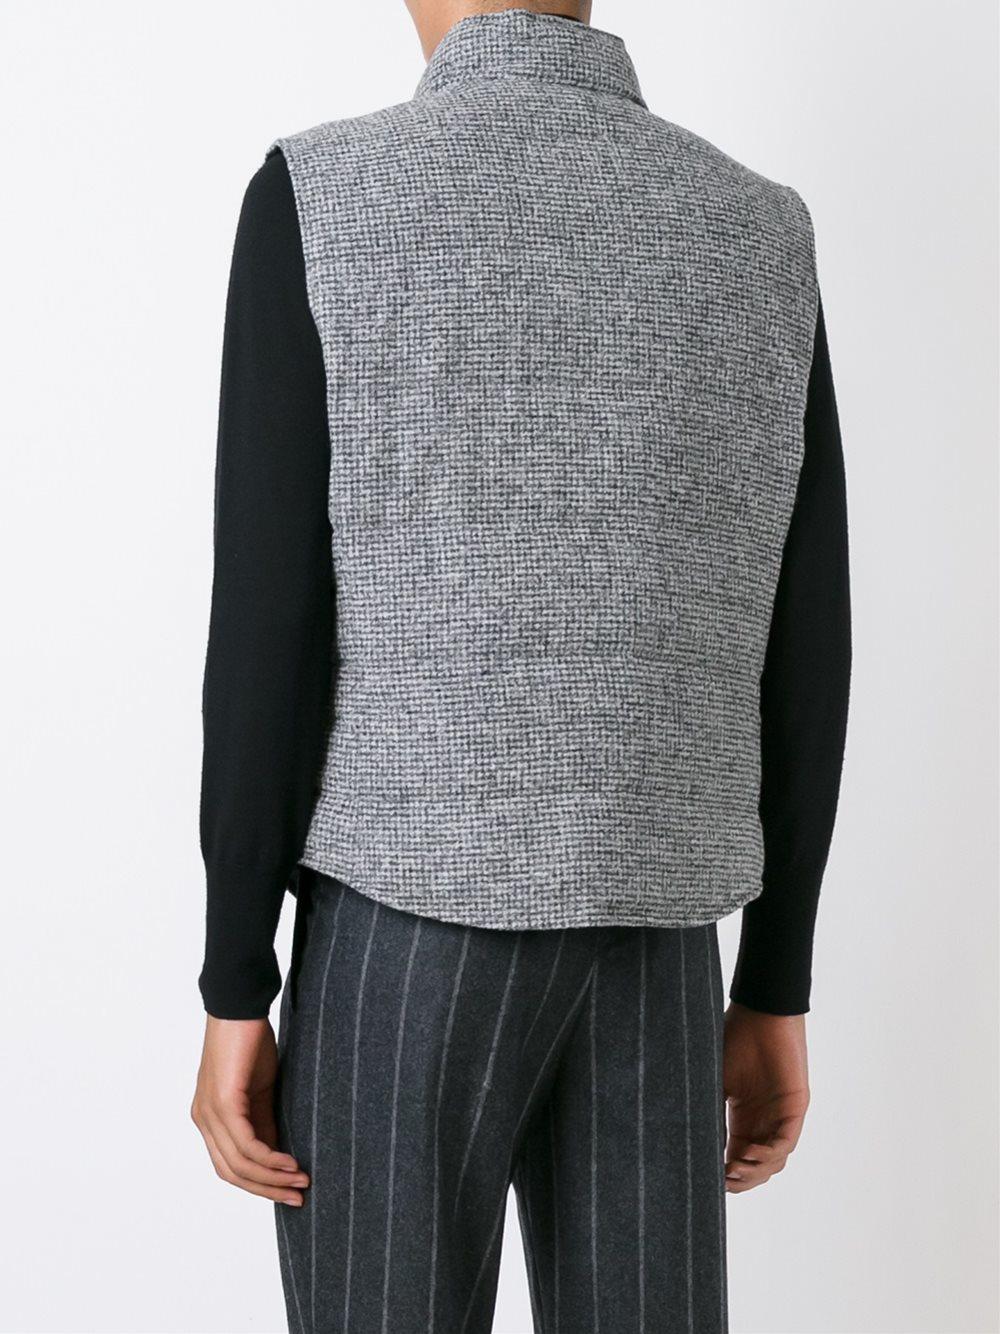 lyst brunello cucinelli pied de poule gilet in gray for men. Black Bedroom Furniture Sets. Home Design Ideas